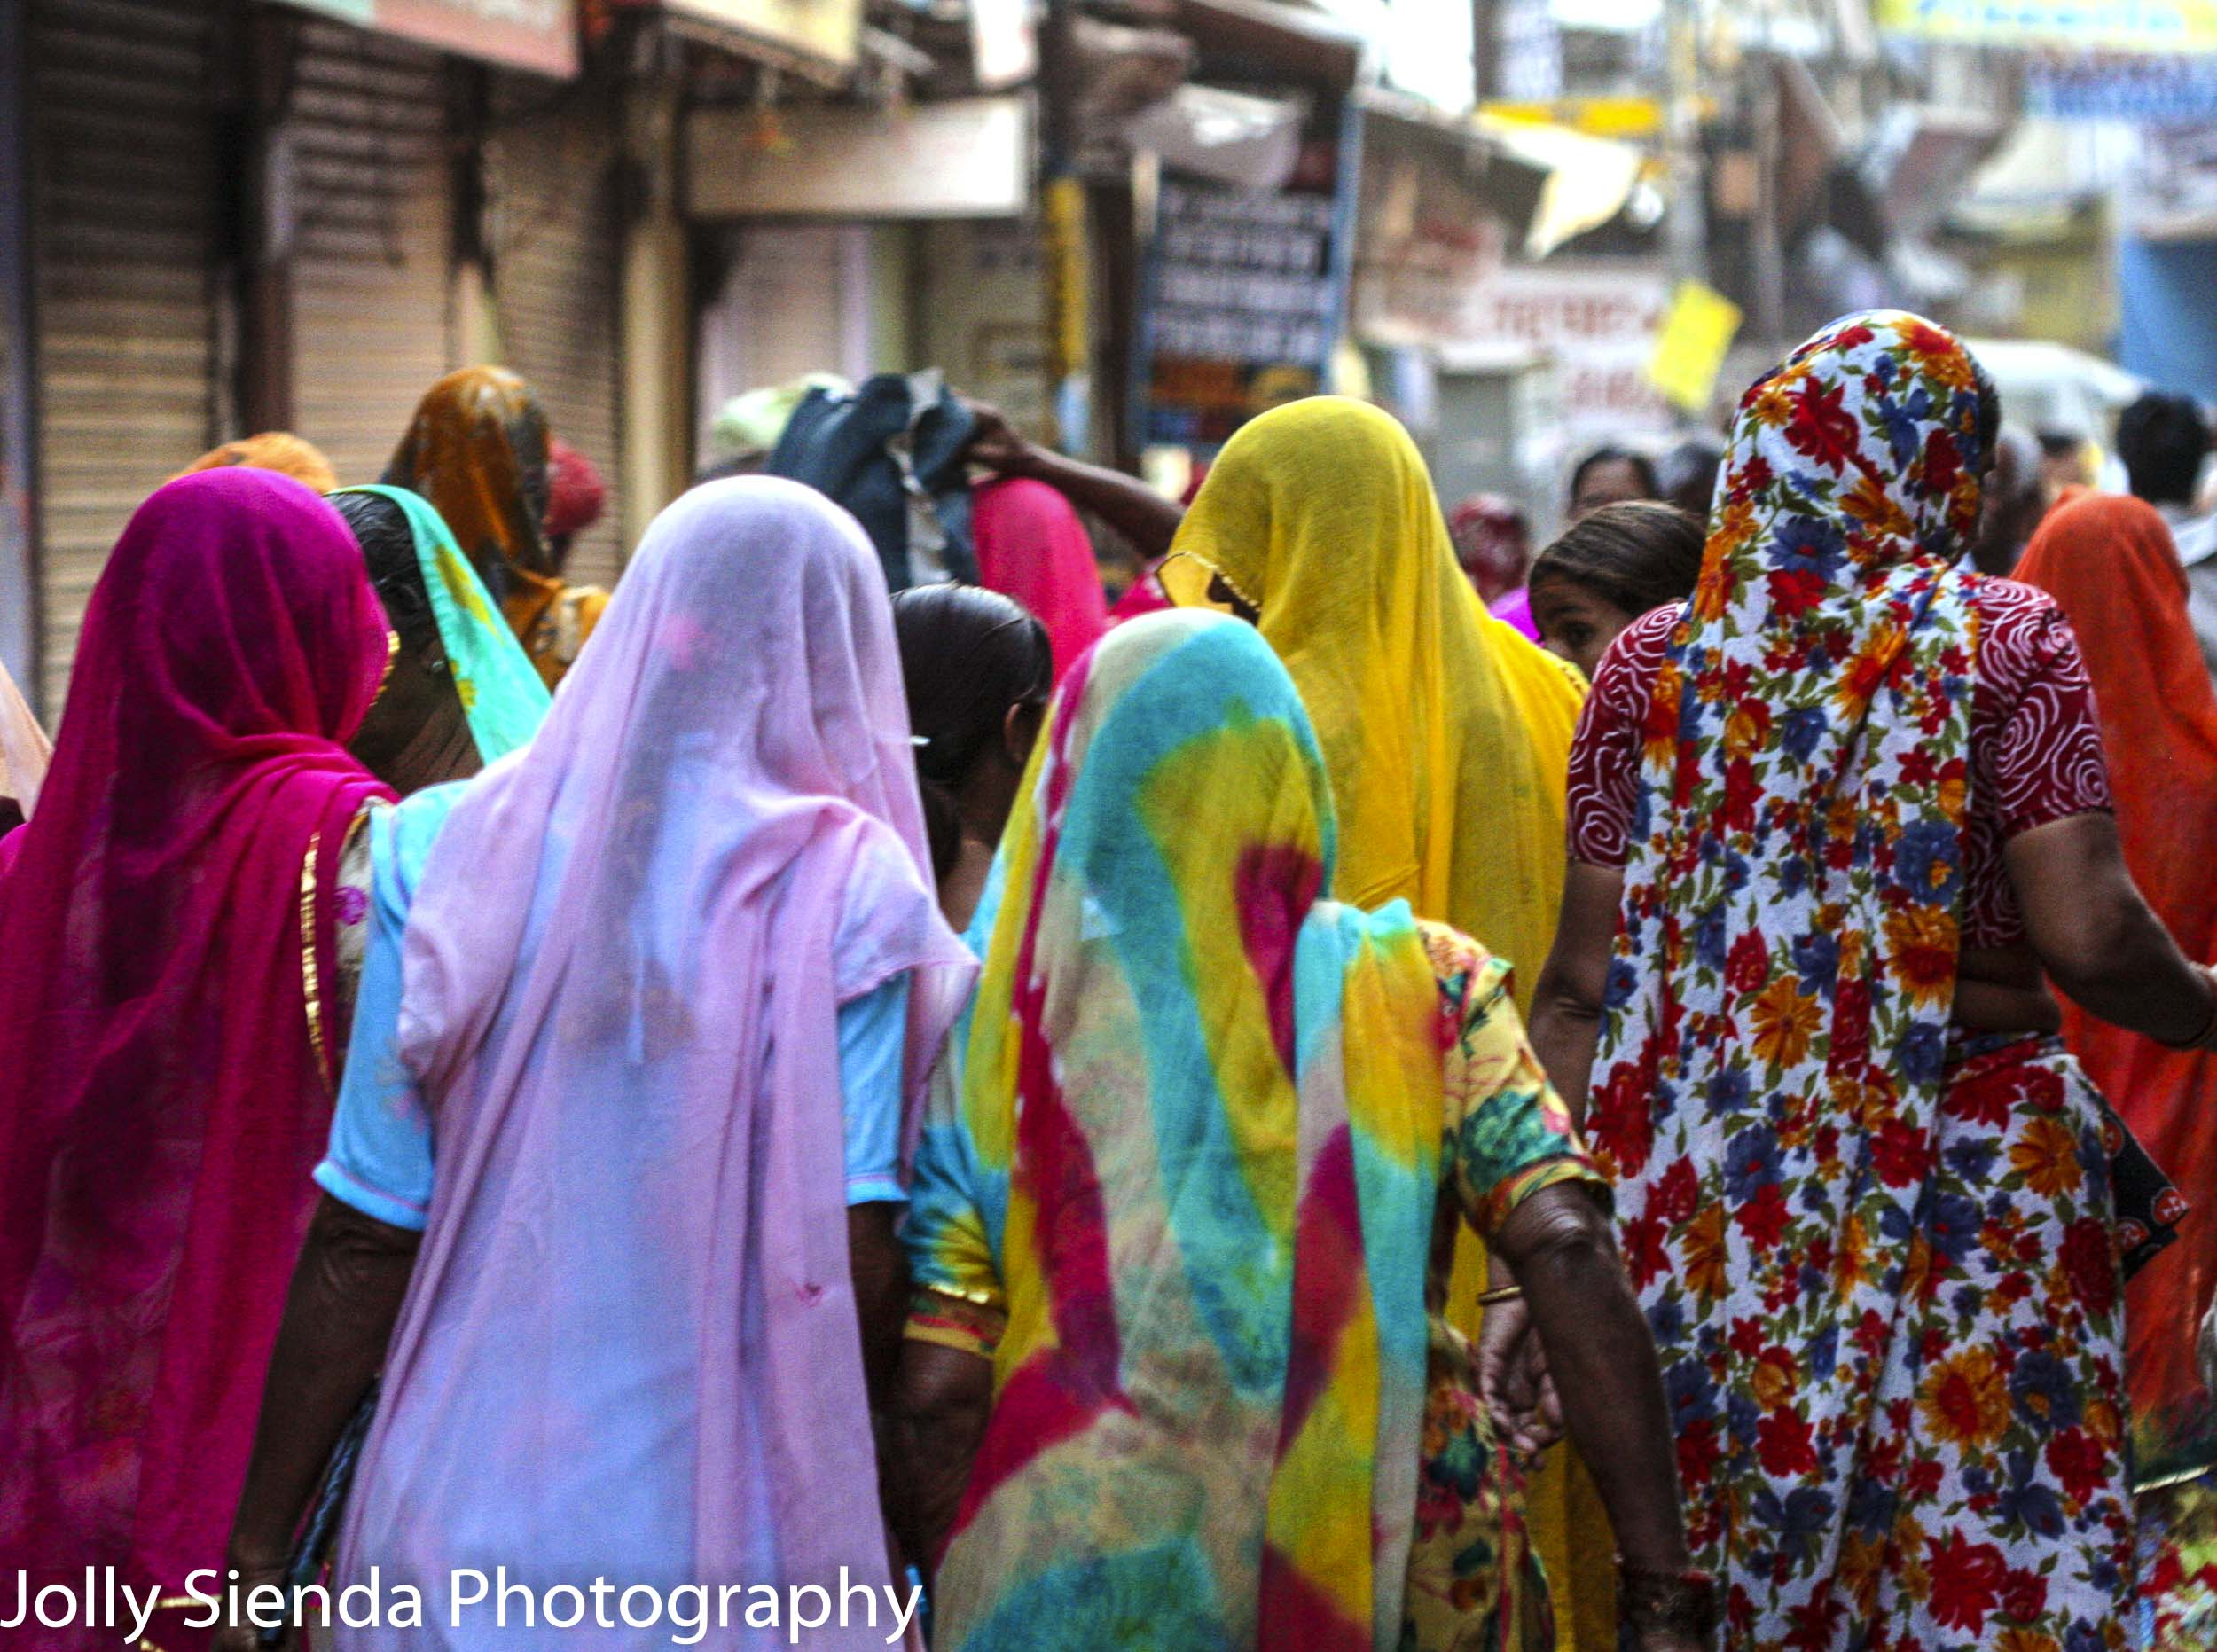 Crowd of women wearing colorful sari's walking in the market